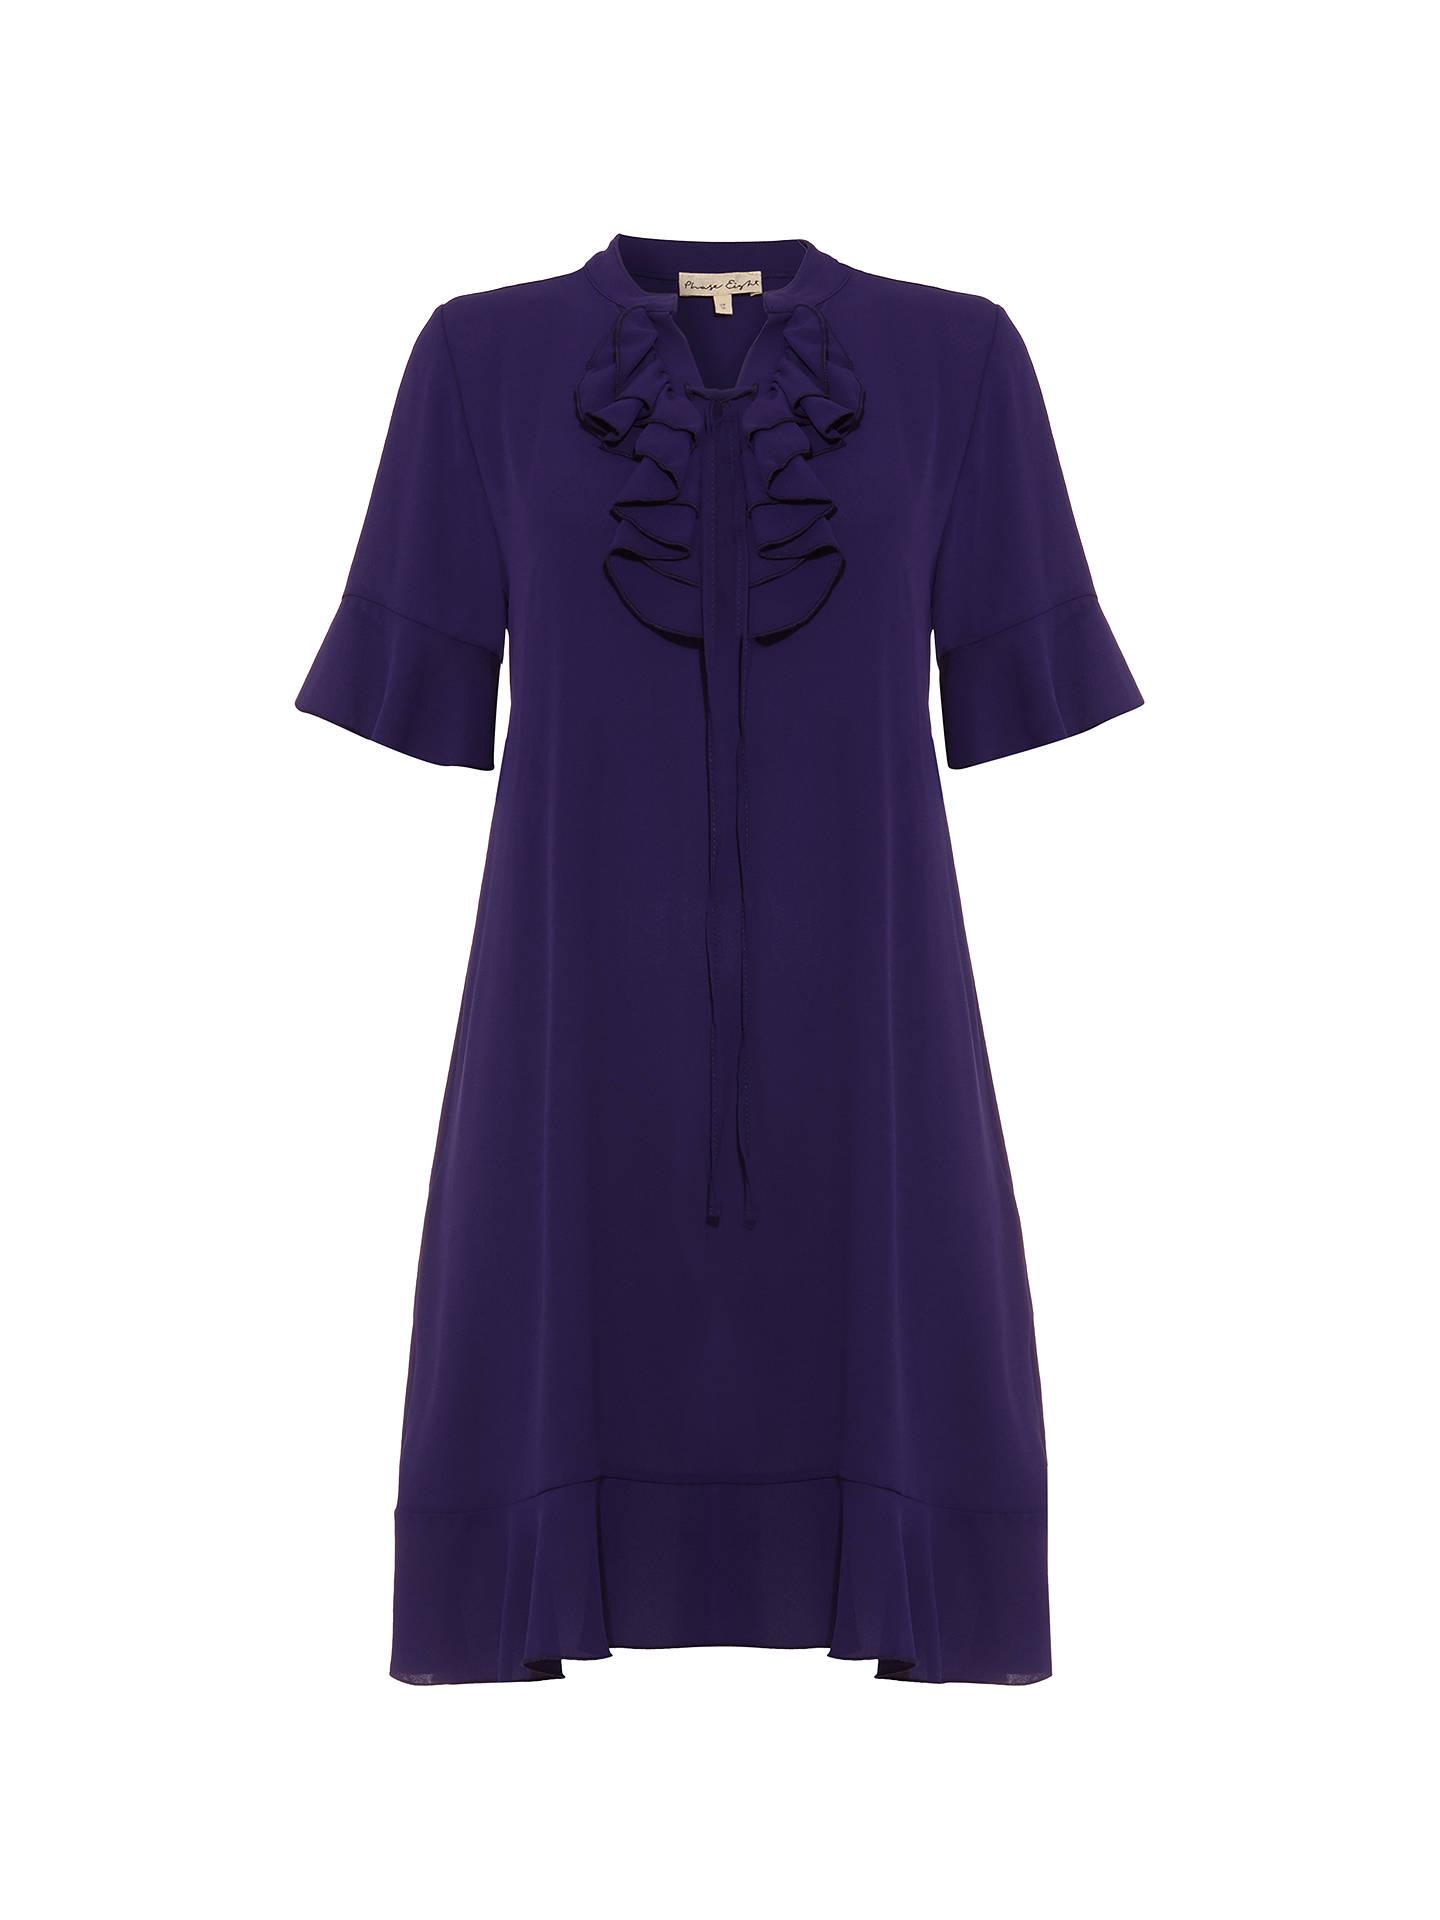 e024c5402b1 Phase Eight Sarah Frill Dress at John Lewis   Partners